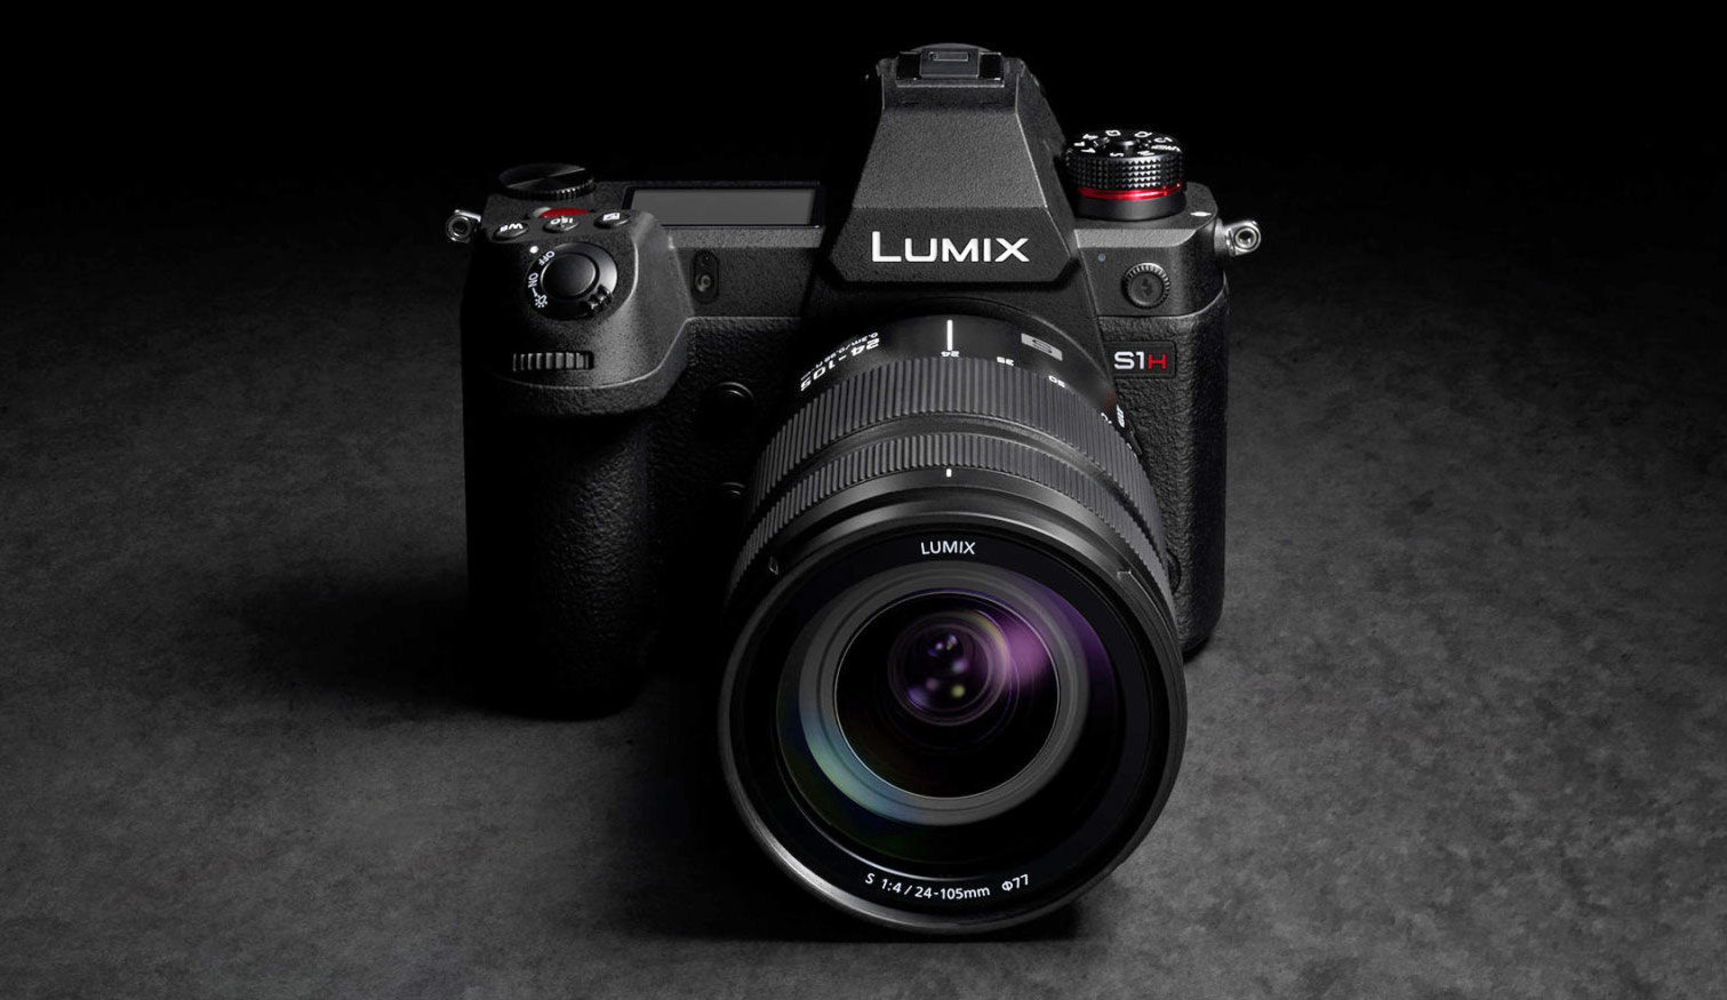 Panasonic Lumix S1H mirrorless full-frame camera announced with 6K video capability